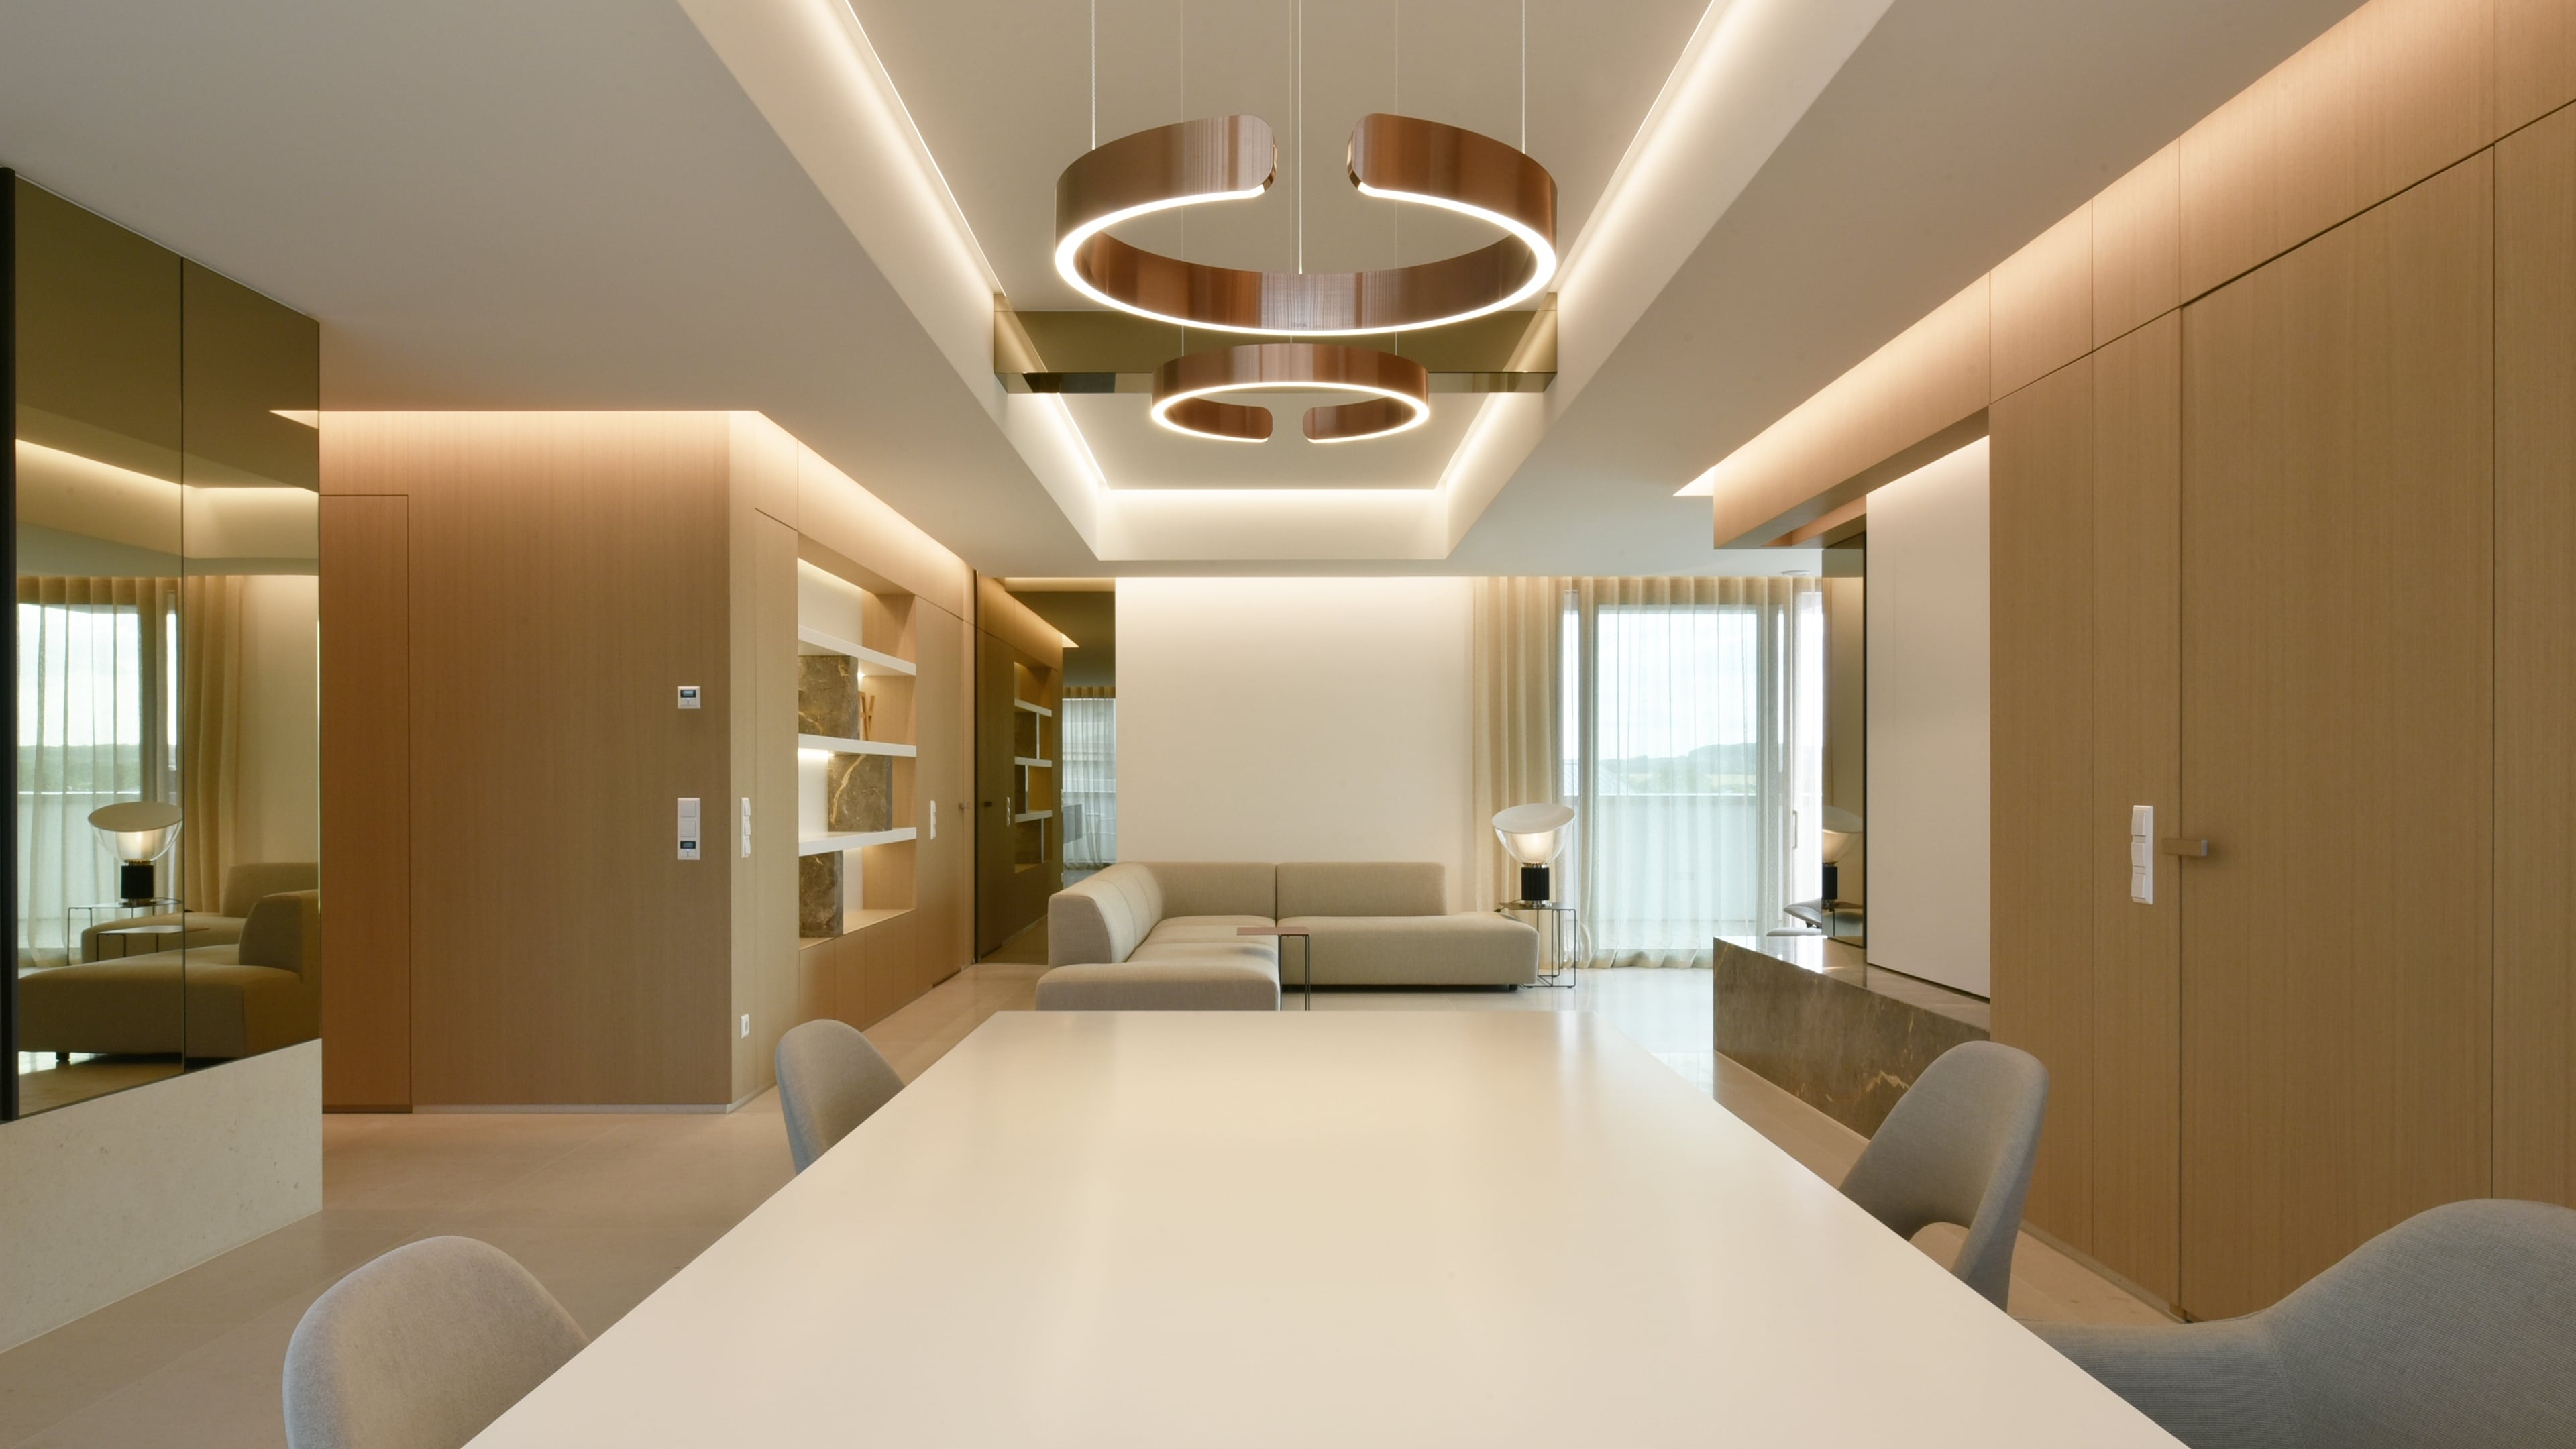 087-luxembourg-penthouse-appartement-luxe-marbre-pierre-bois-interieur-architecture-cfa-cfarchitectes-luxury-apartment-highstanding-stone-wood-interiors-design-minimalist-investment-luxemburg-furniture-12